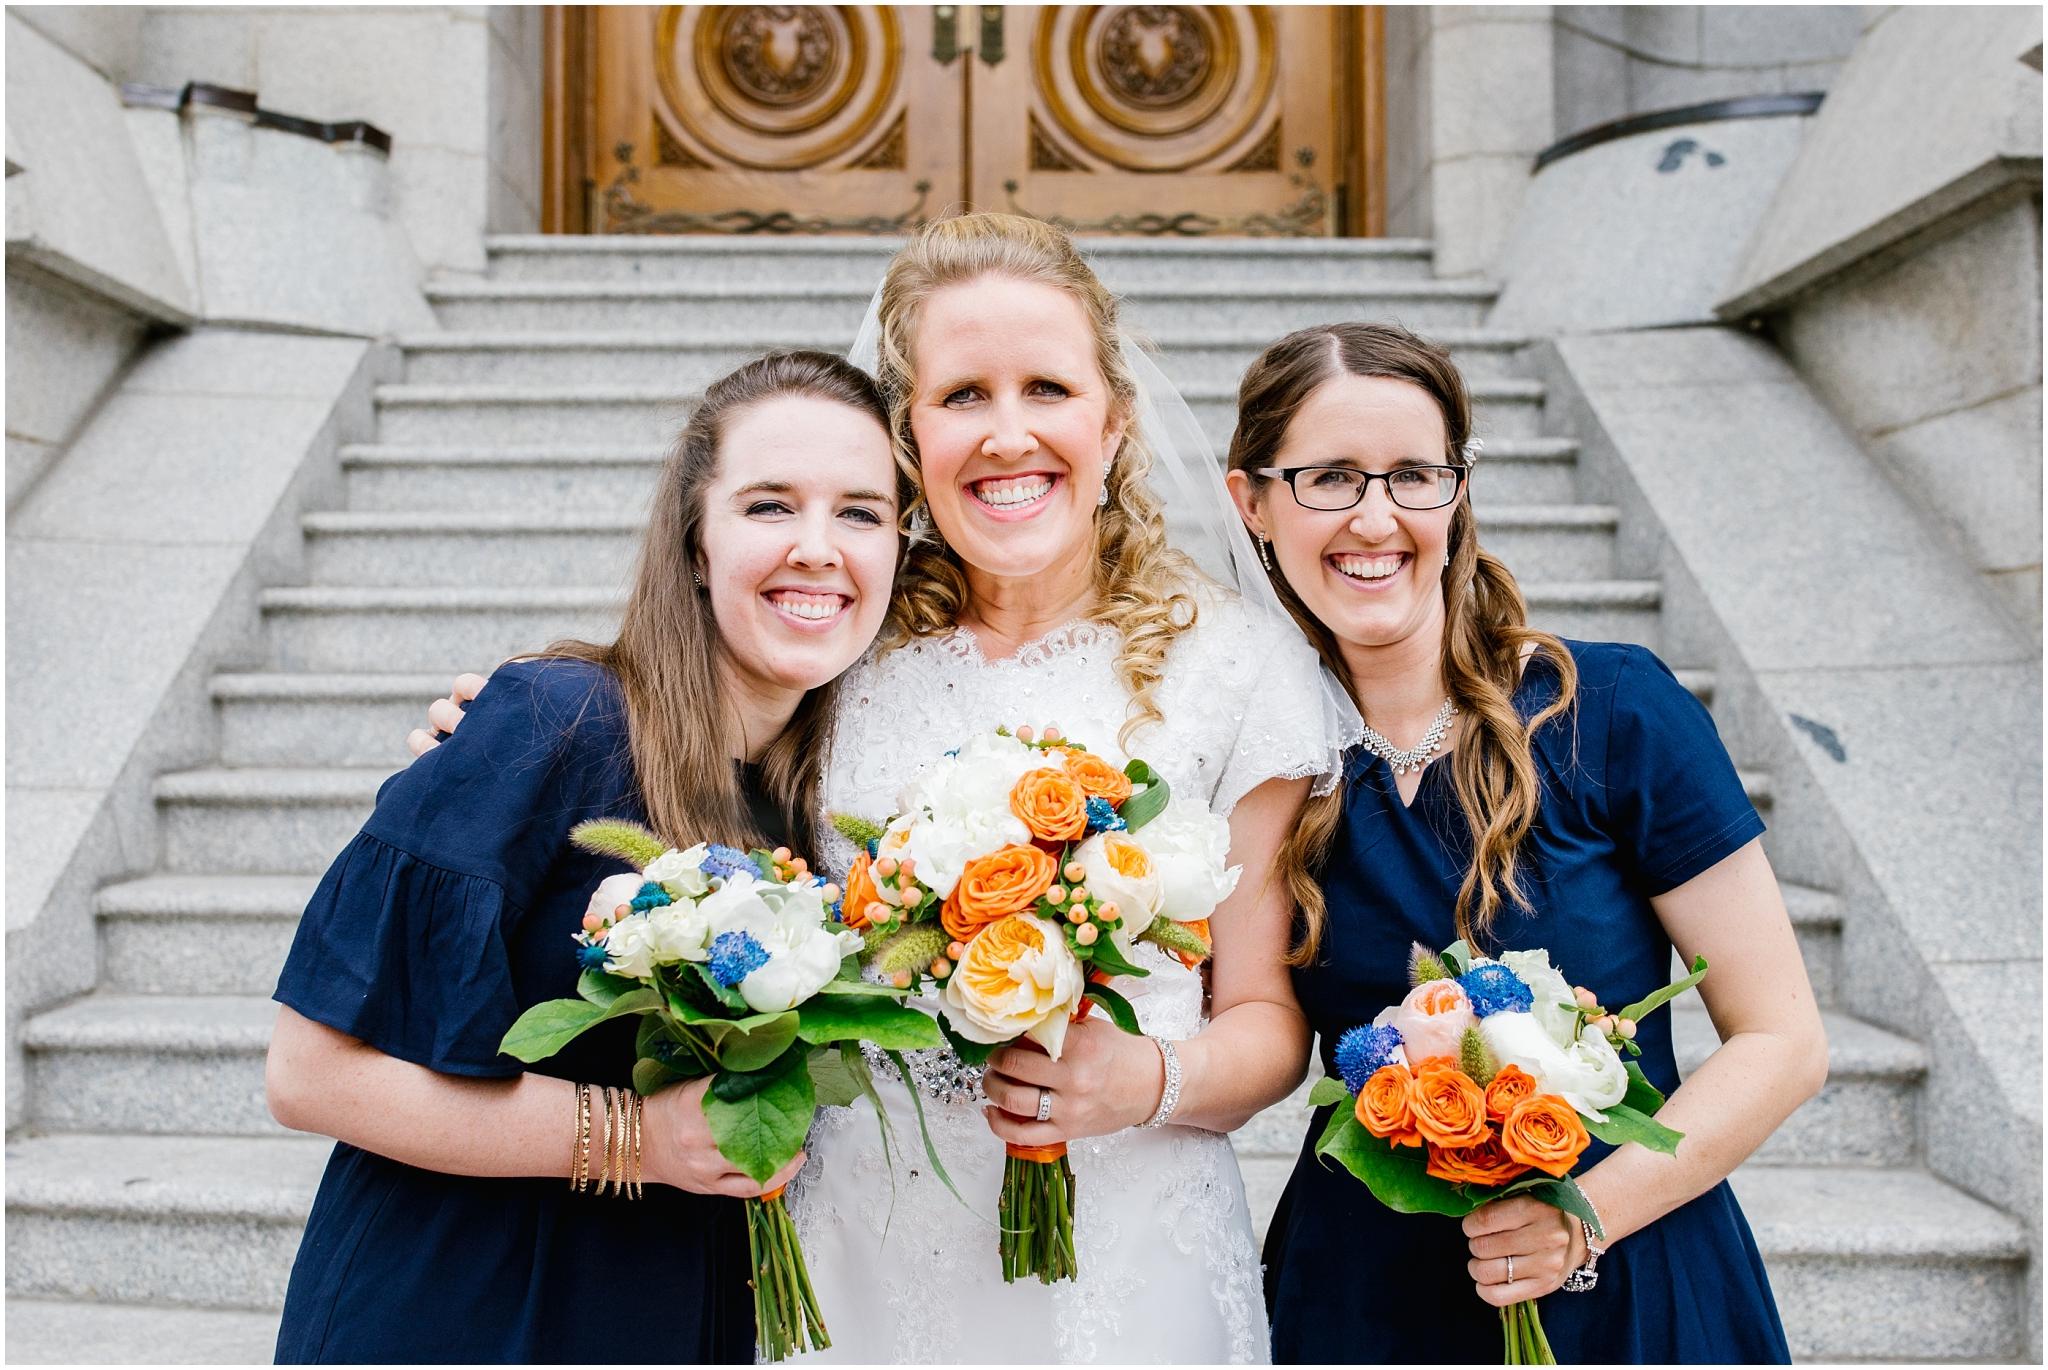 Justin and Melissa-51_Lizzie-B-Imagery-Utah-Wedding-Photographer-Salt-Lake-City-Temple-The-Grand-Ballroom.jpg